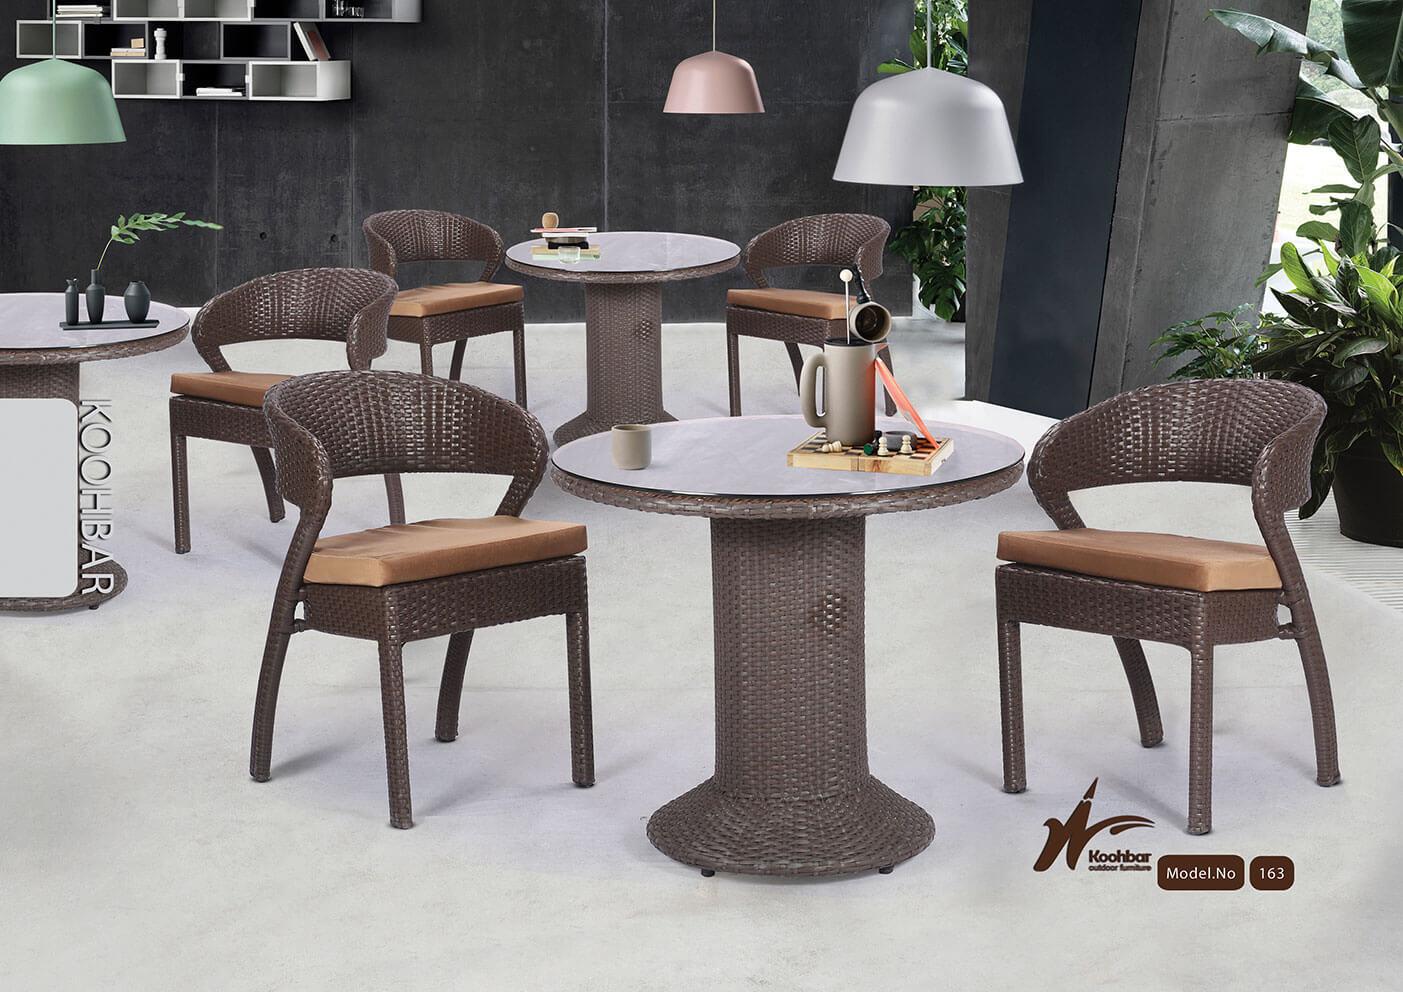 kohbar patio conversation sets 163 model0 - ست میز صندلی حصیری فضای باز کوهبر مدل ۱۶۳ -  - patio-conversation-sets